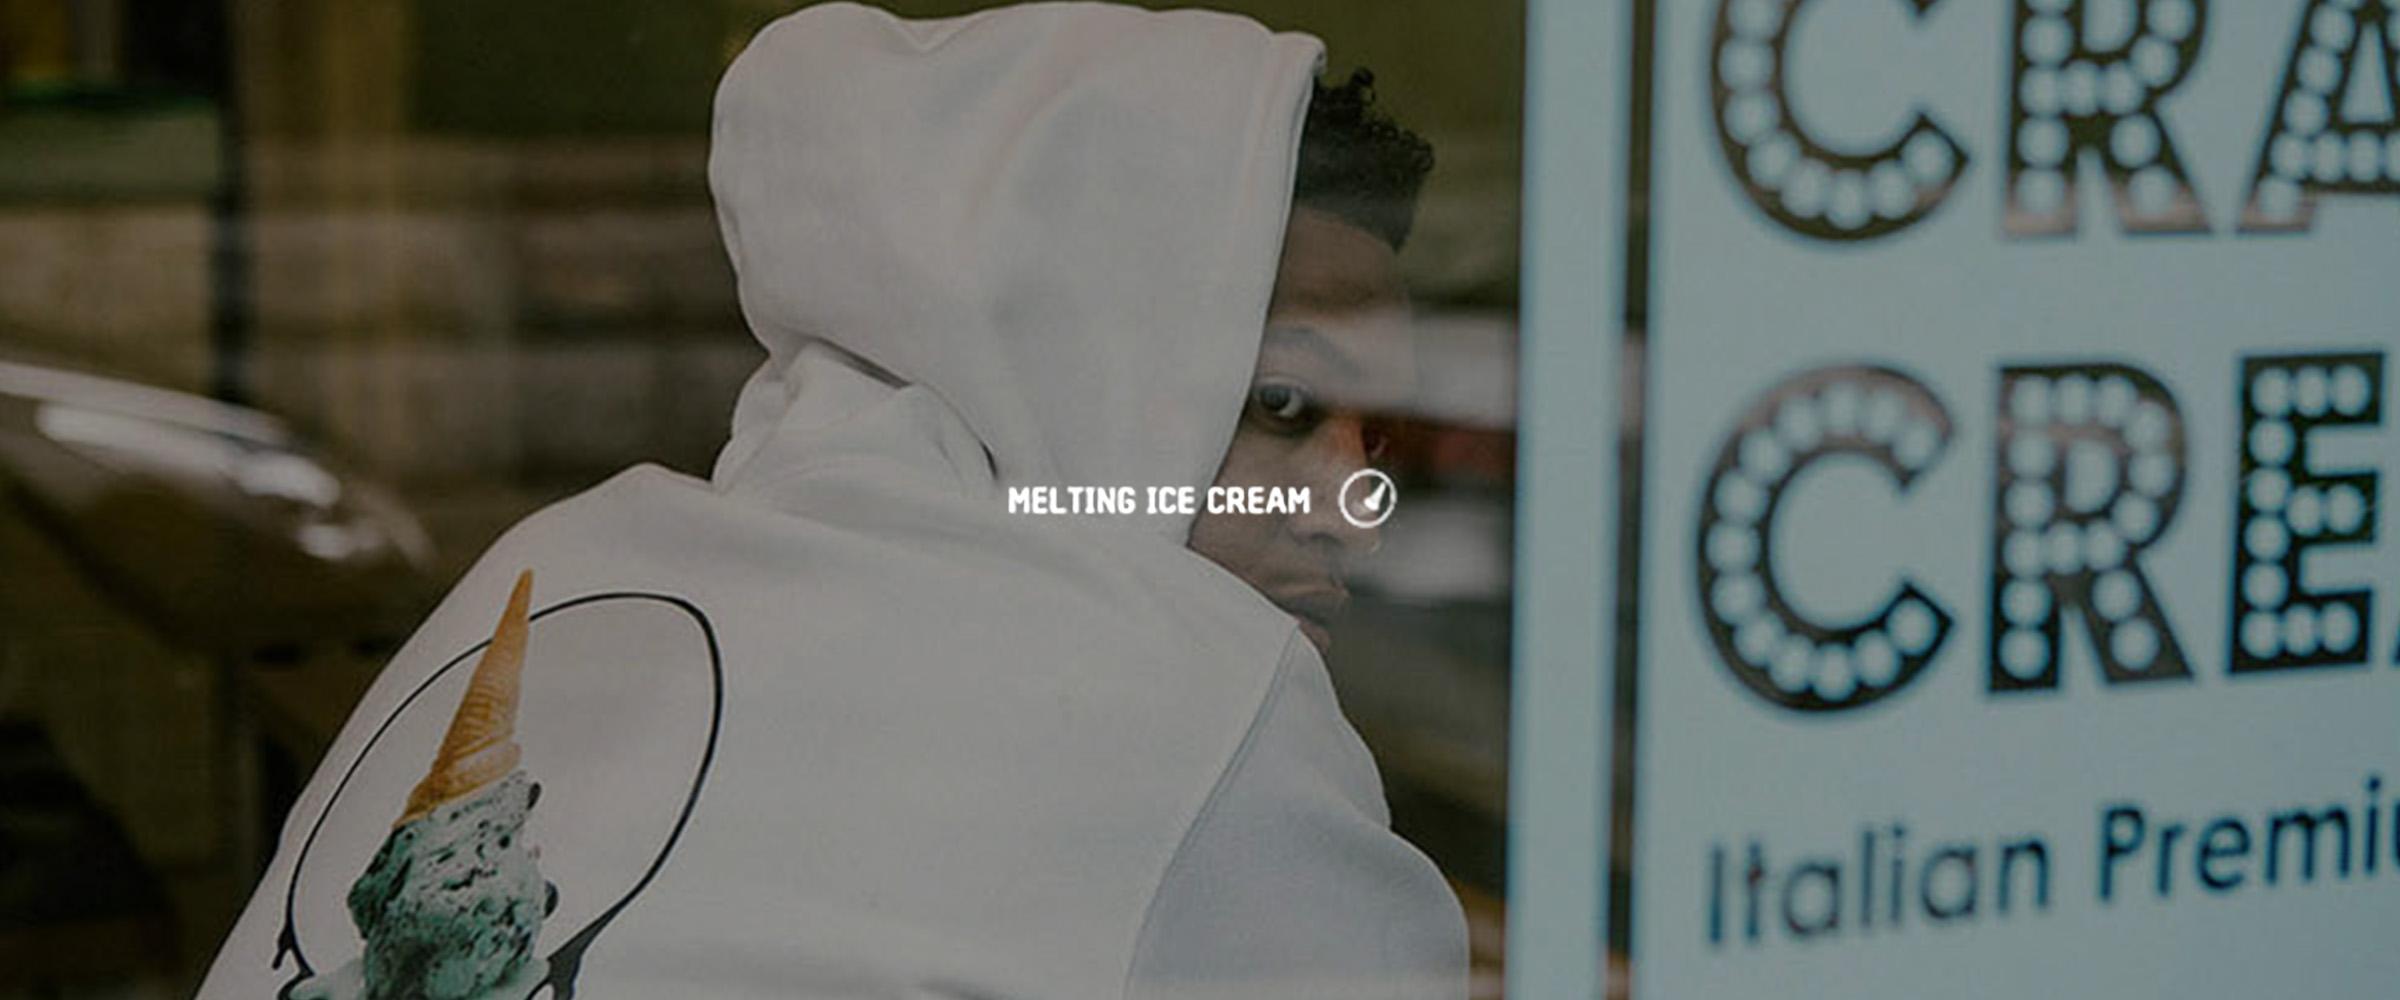 melting icecream.jpg